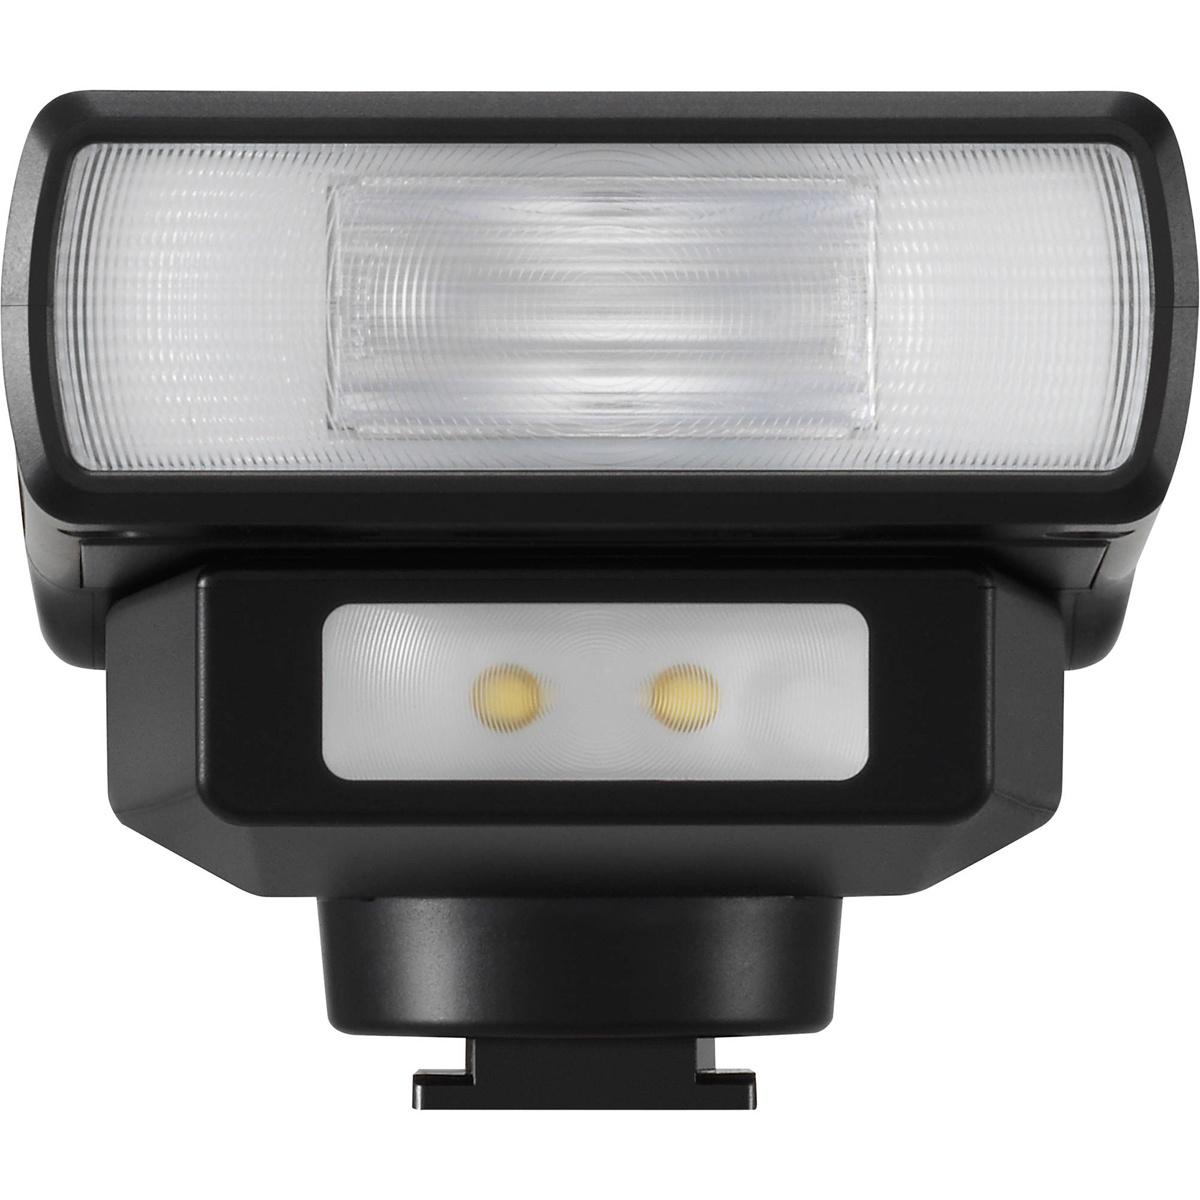 Panasonic DMW-FL200 Externes Blitzlicht mit LED